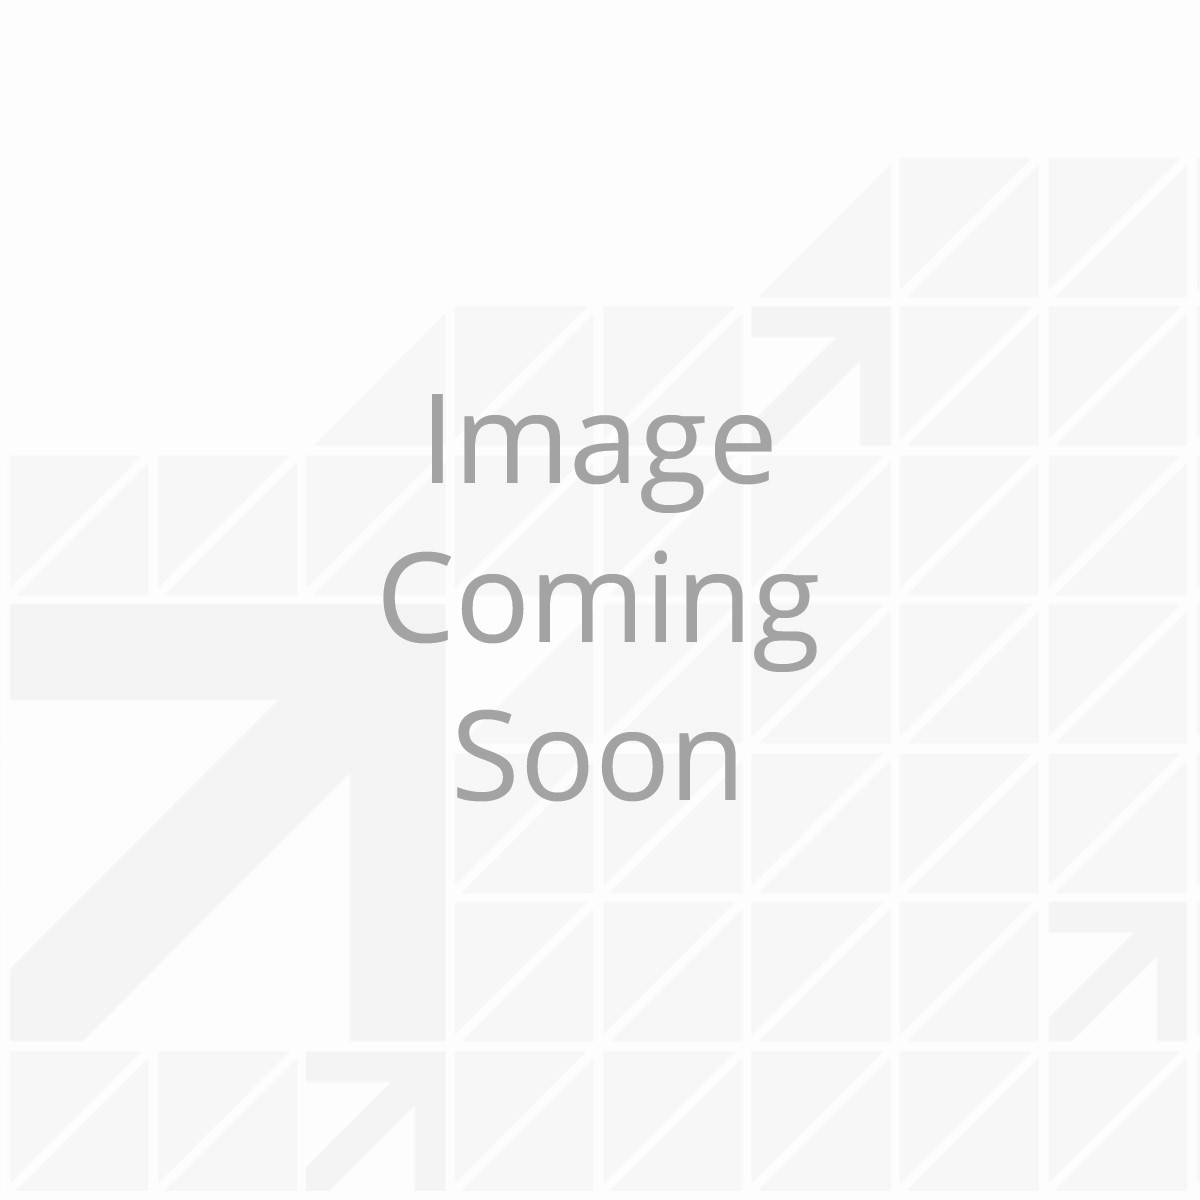 181440_Cone-Nut_001